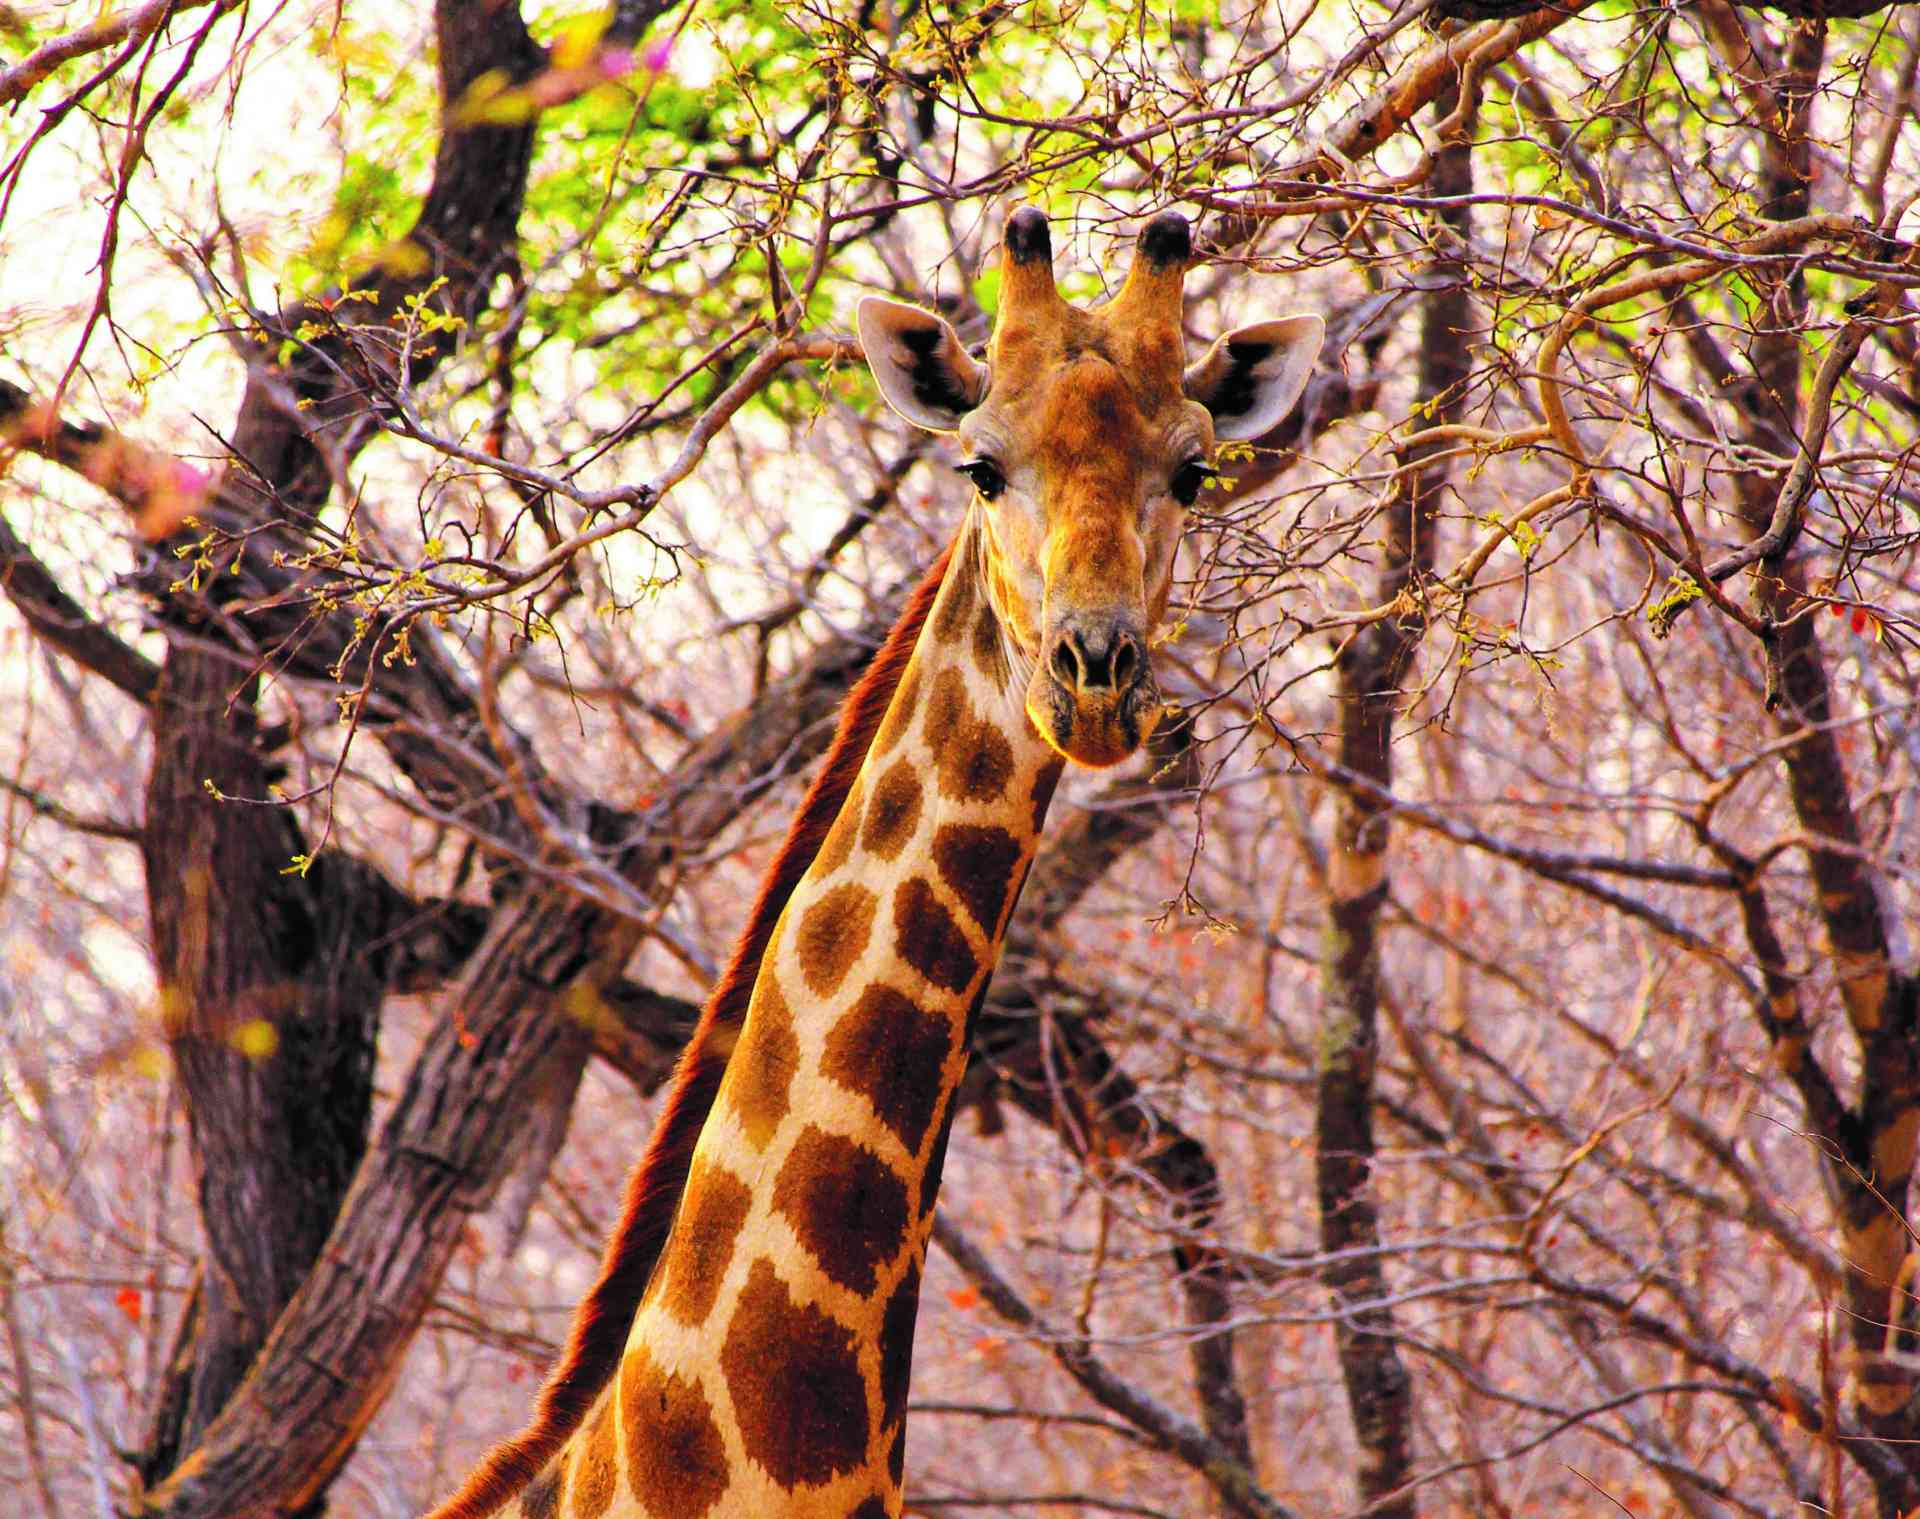 Giraffe, Hwange National Park, Zimbabwe by Abbie Bell